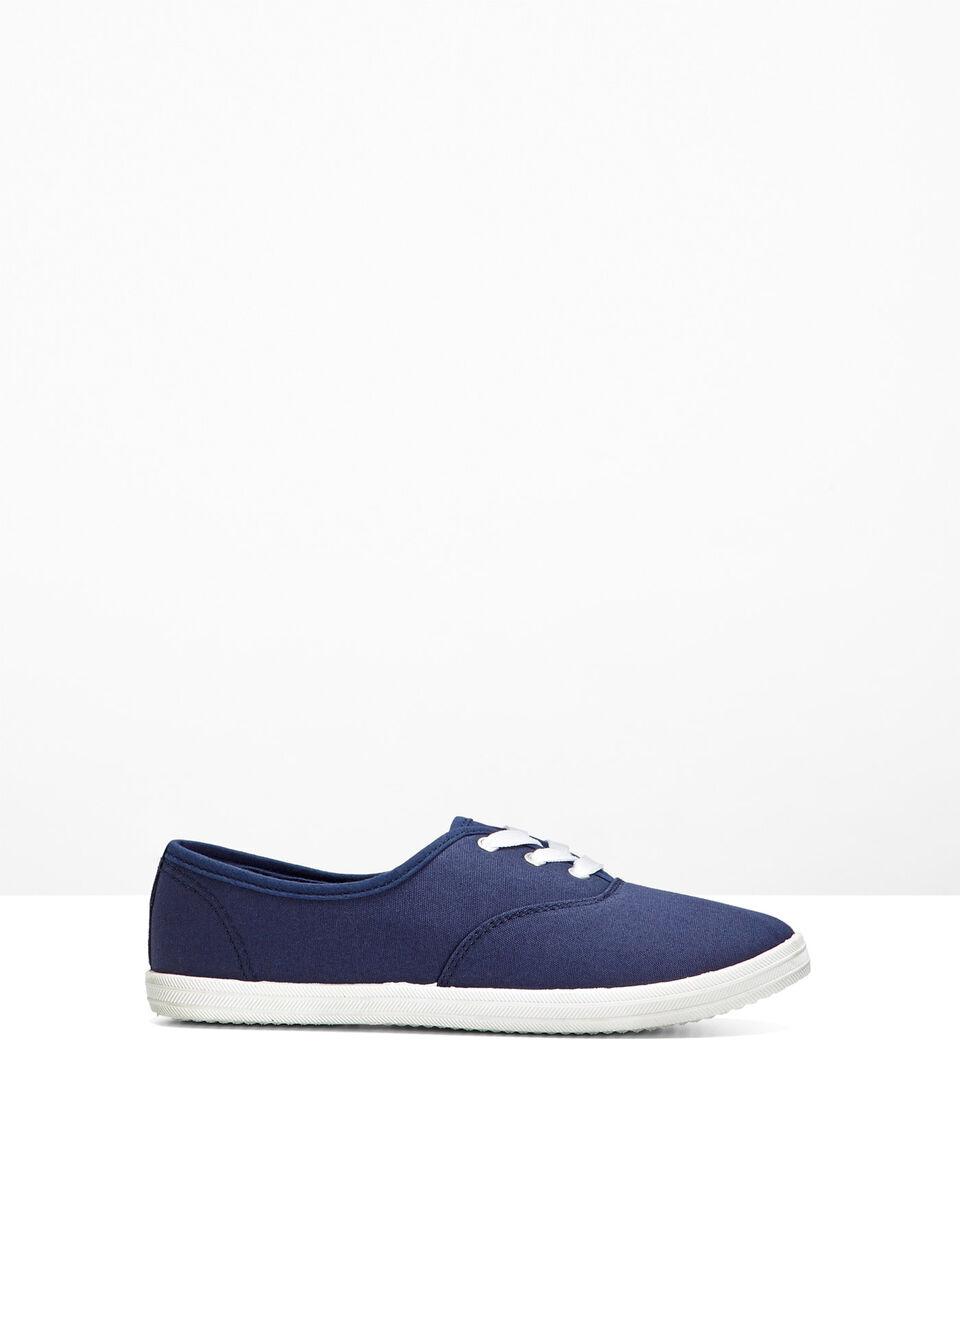 Sneakersy bonprix niebieski dżins